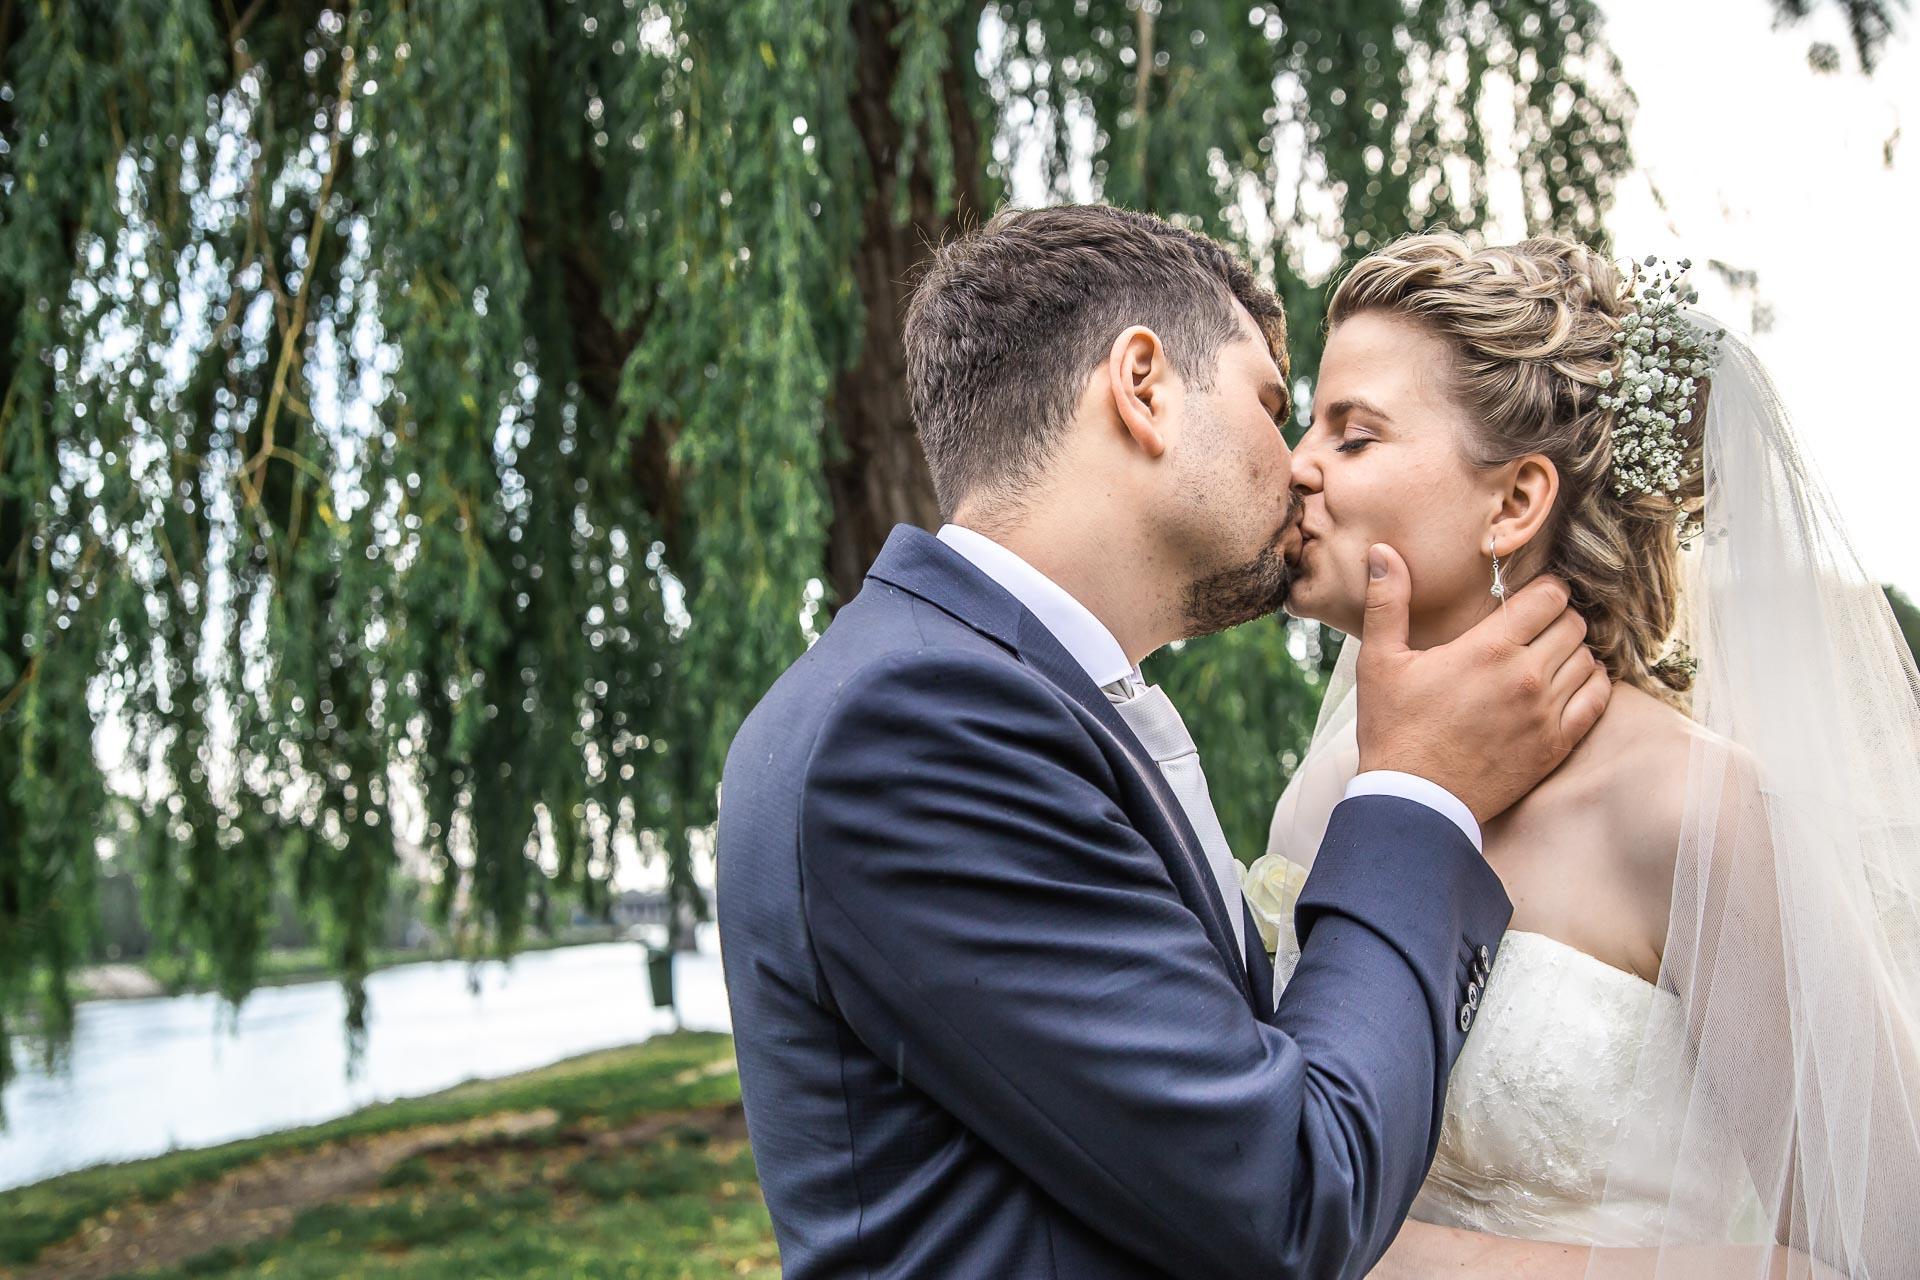 Svatební-fotograf-Nymburk-6326